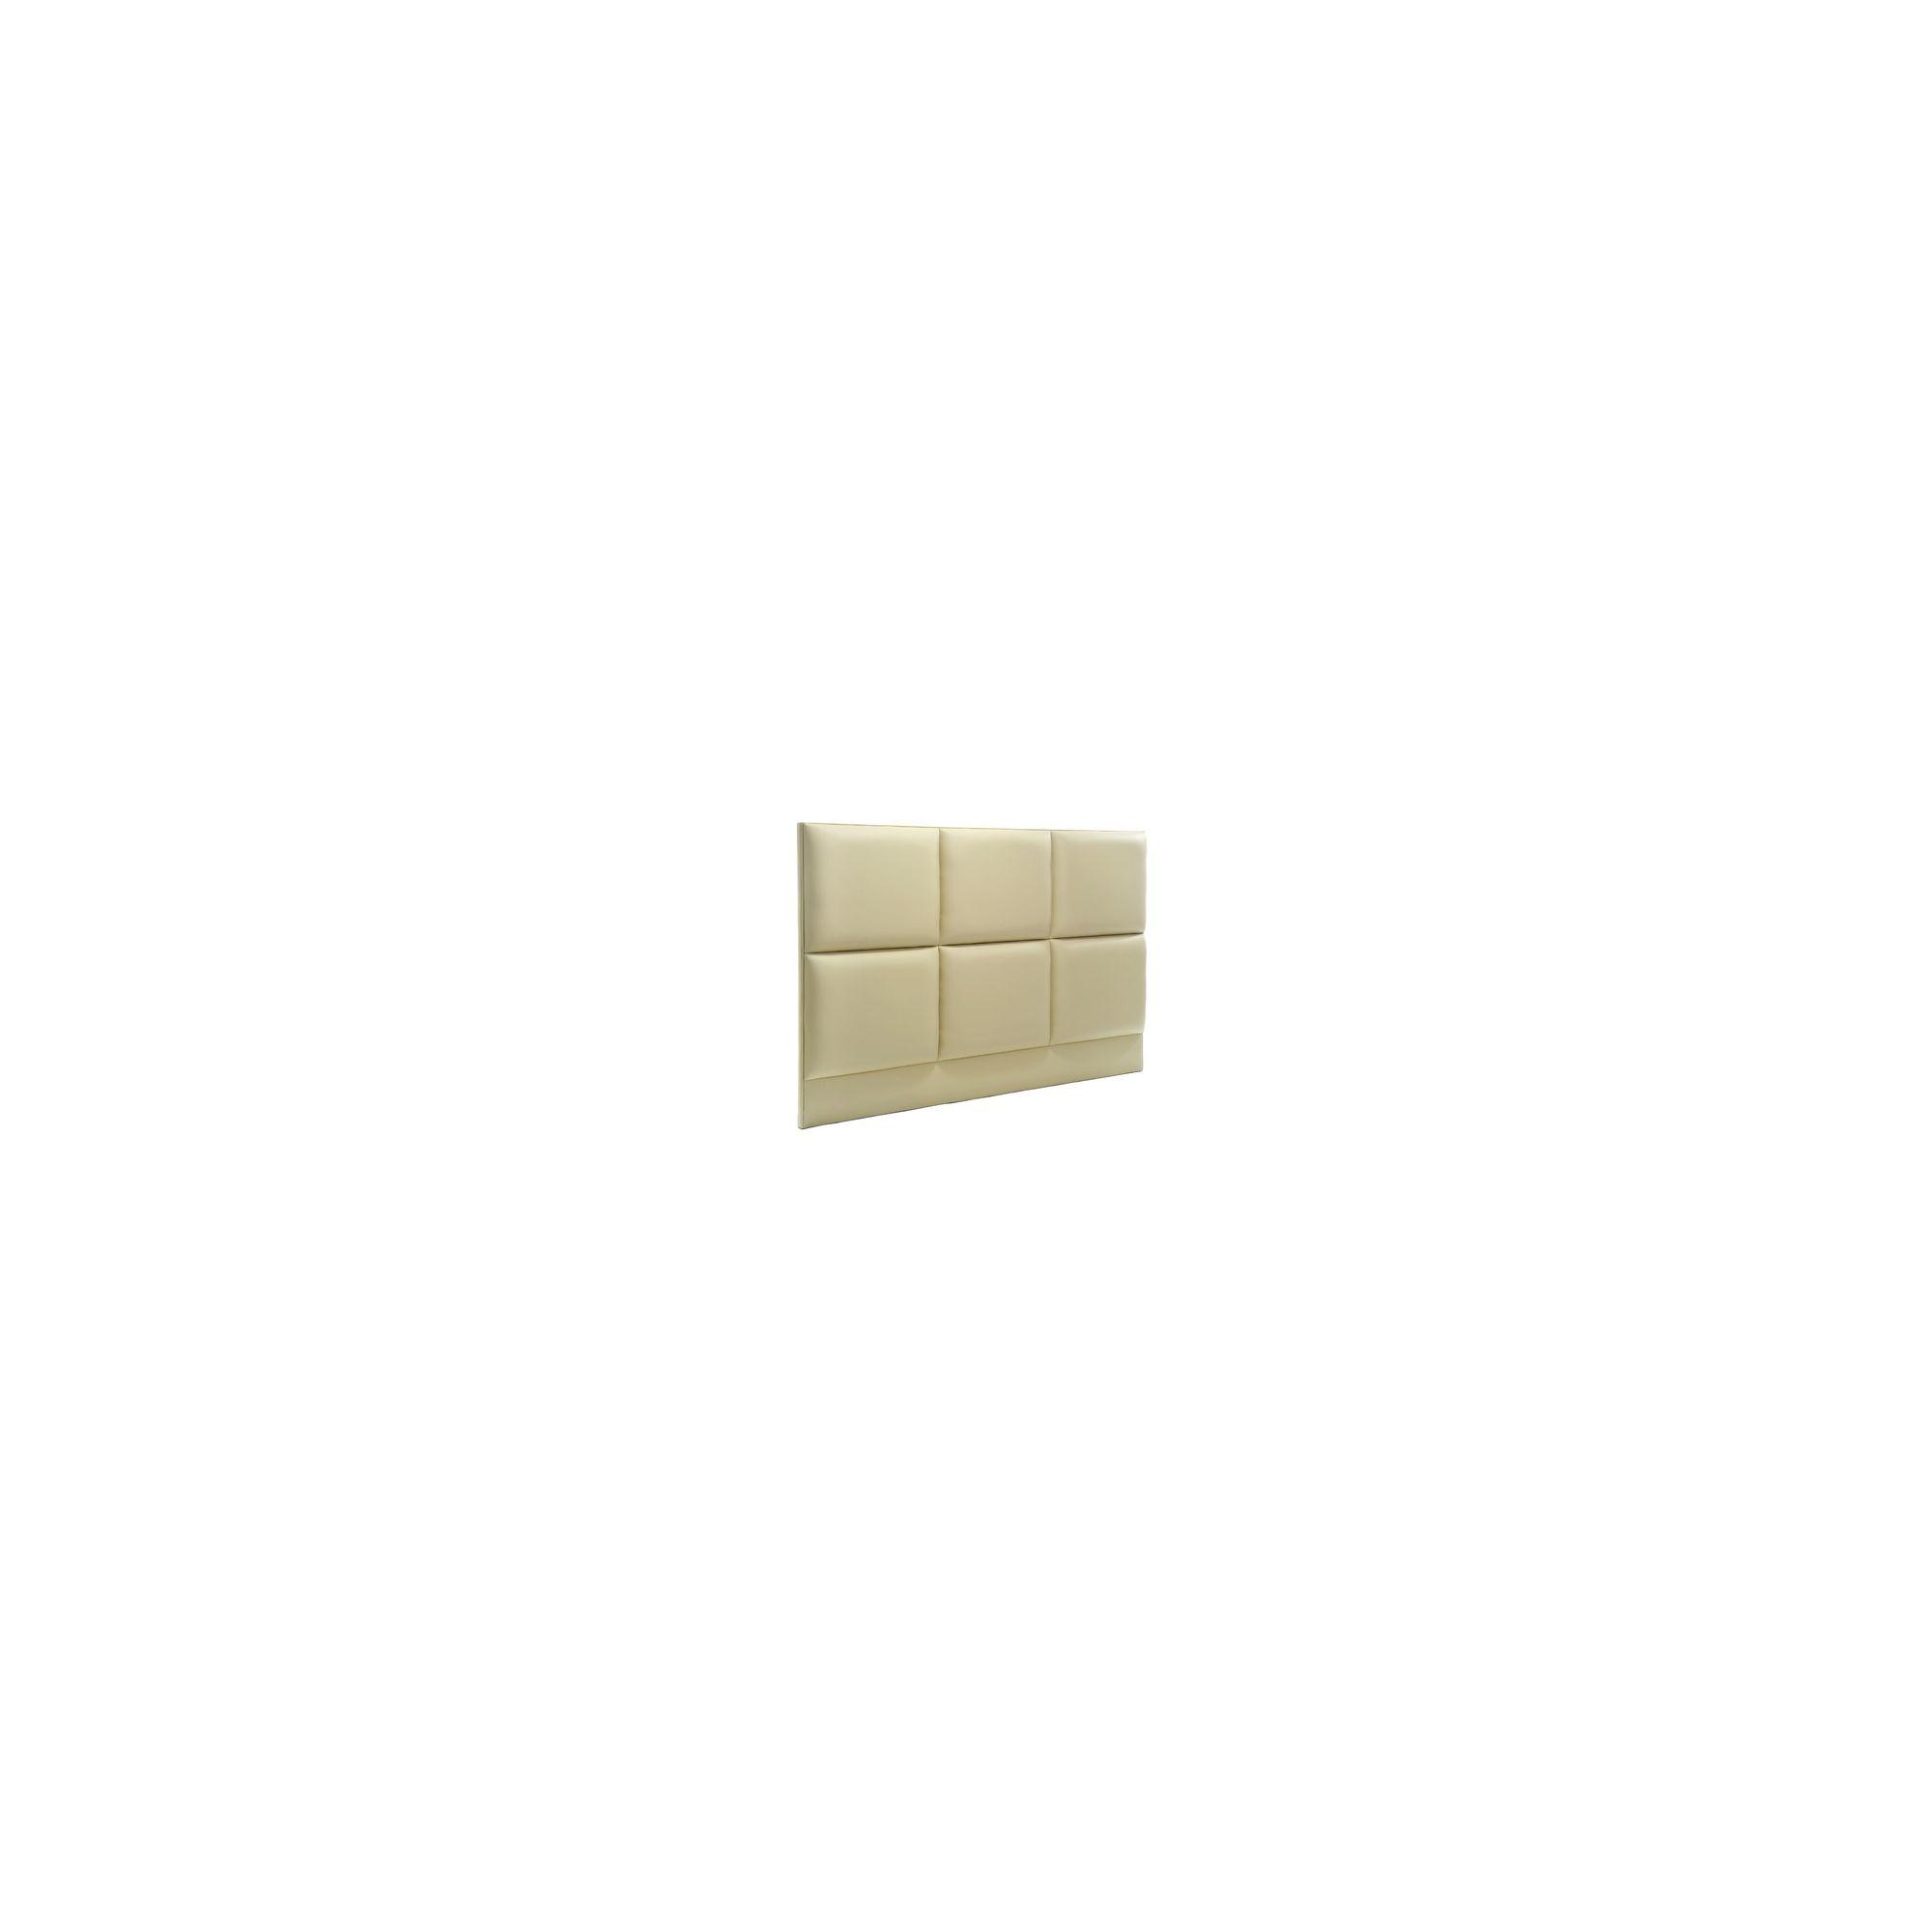 PC Upholstery Columbo Headboard - Kansas Cream - 6' Super King at Tesco Direct